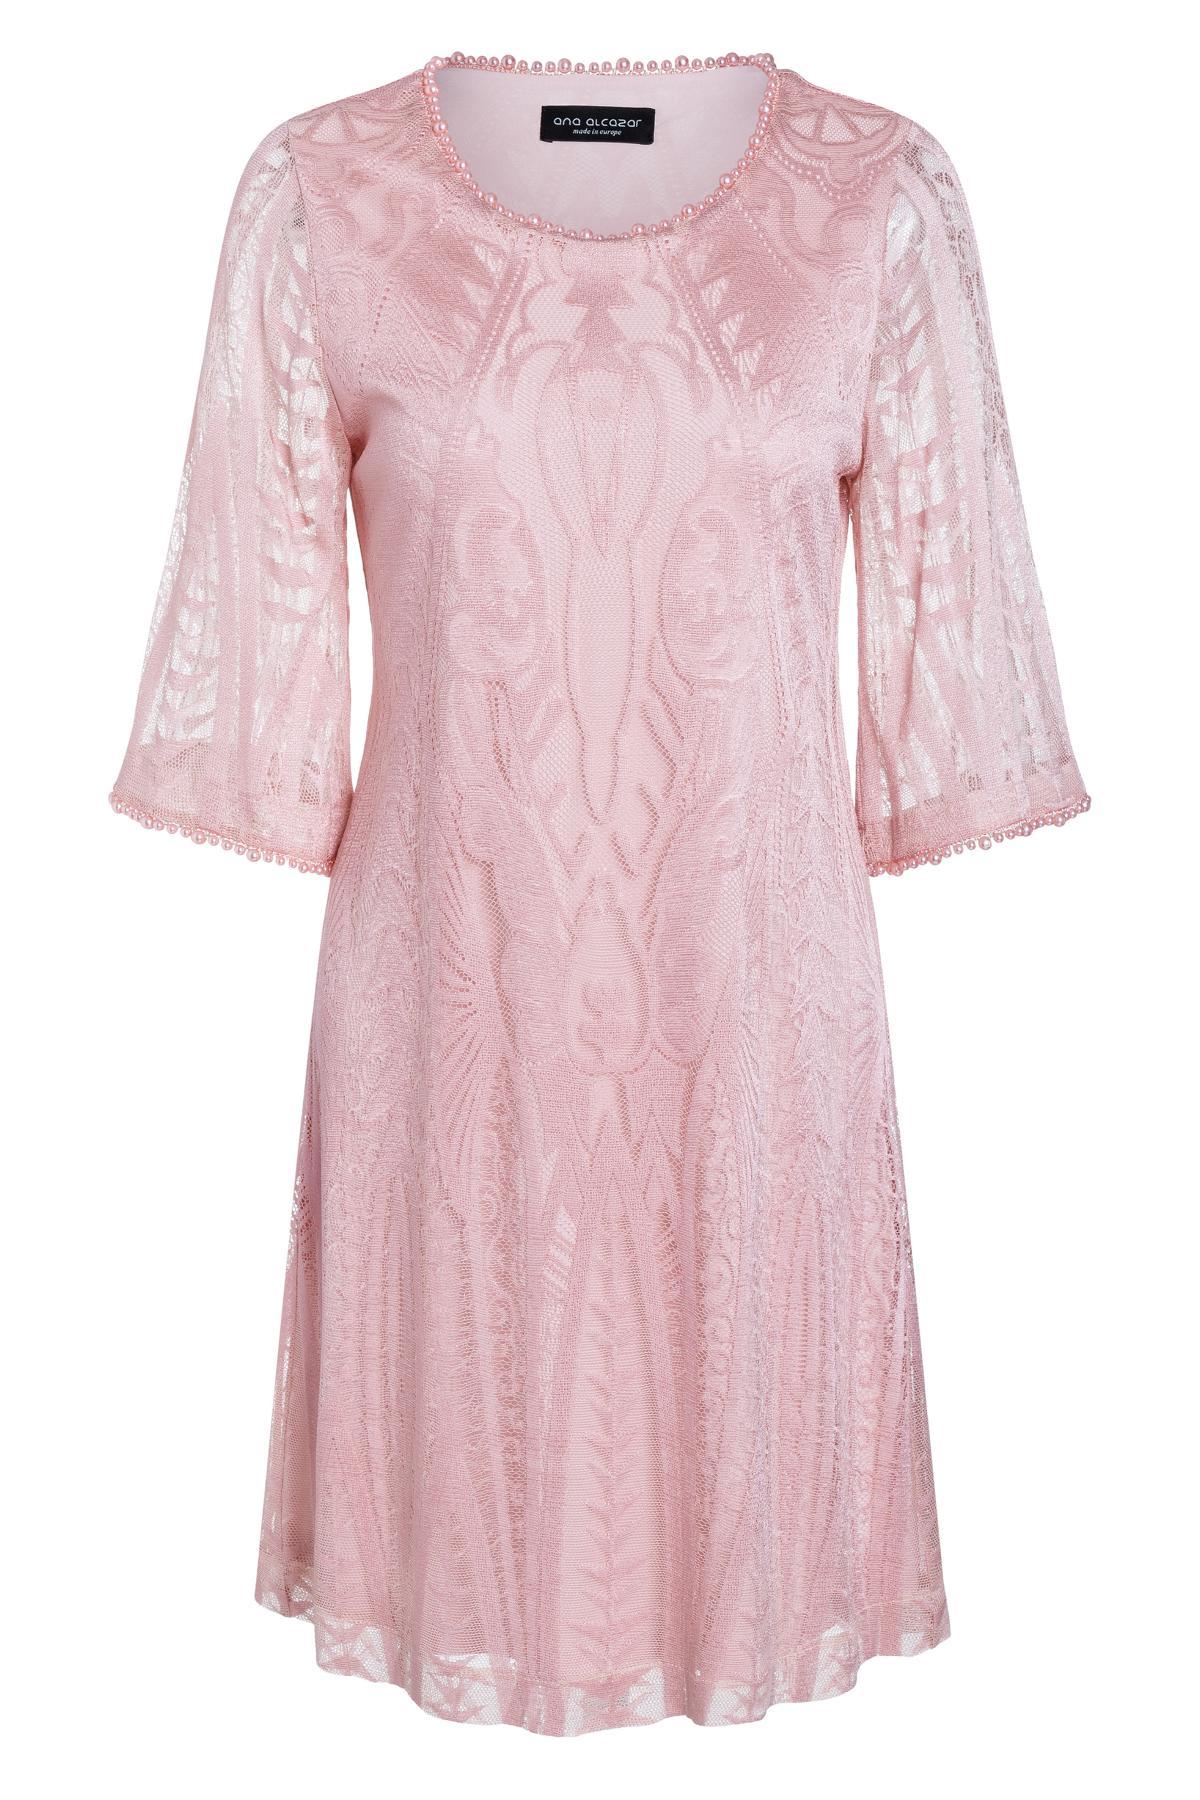 Ana Alcazar Shortsleeve Dress Sarivei